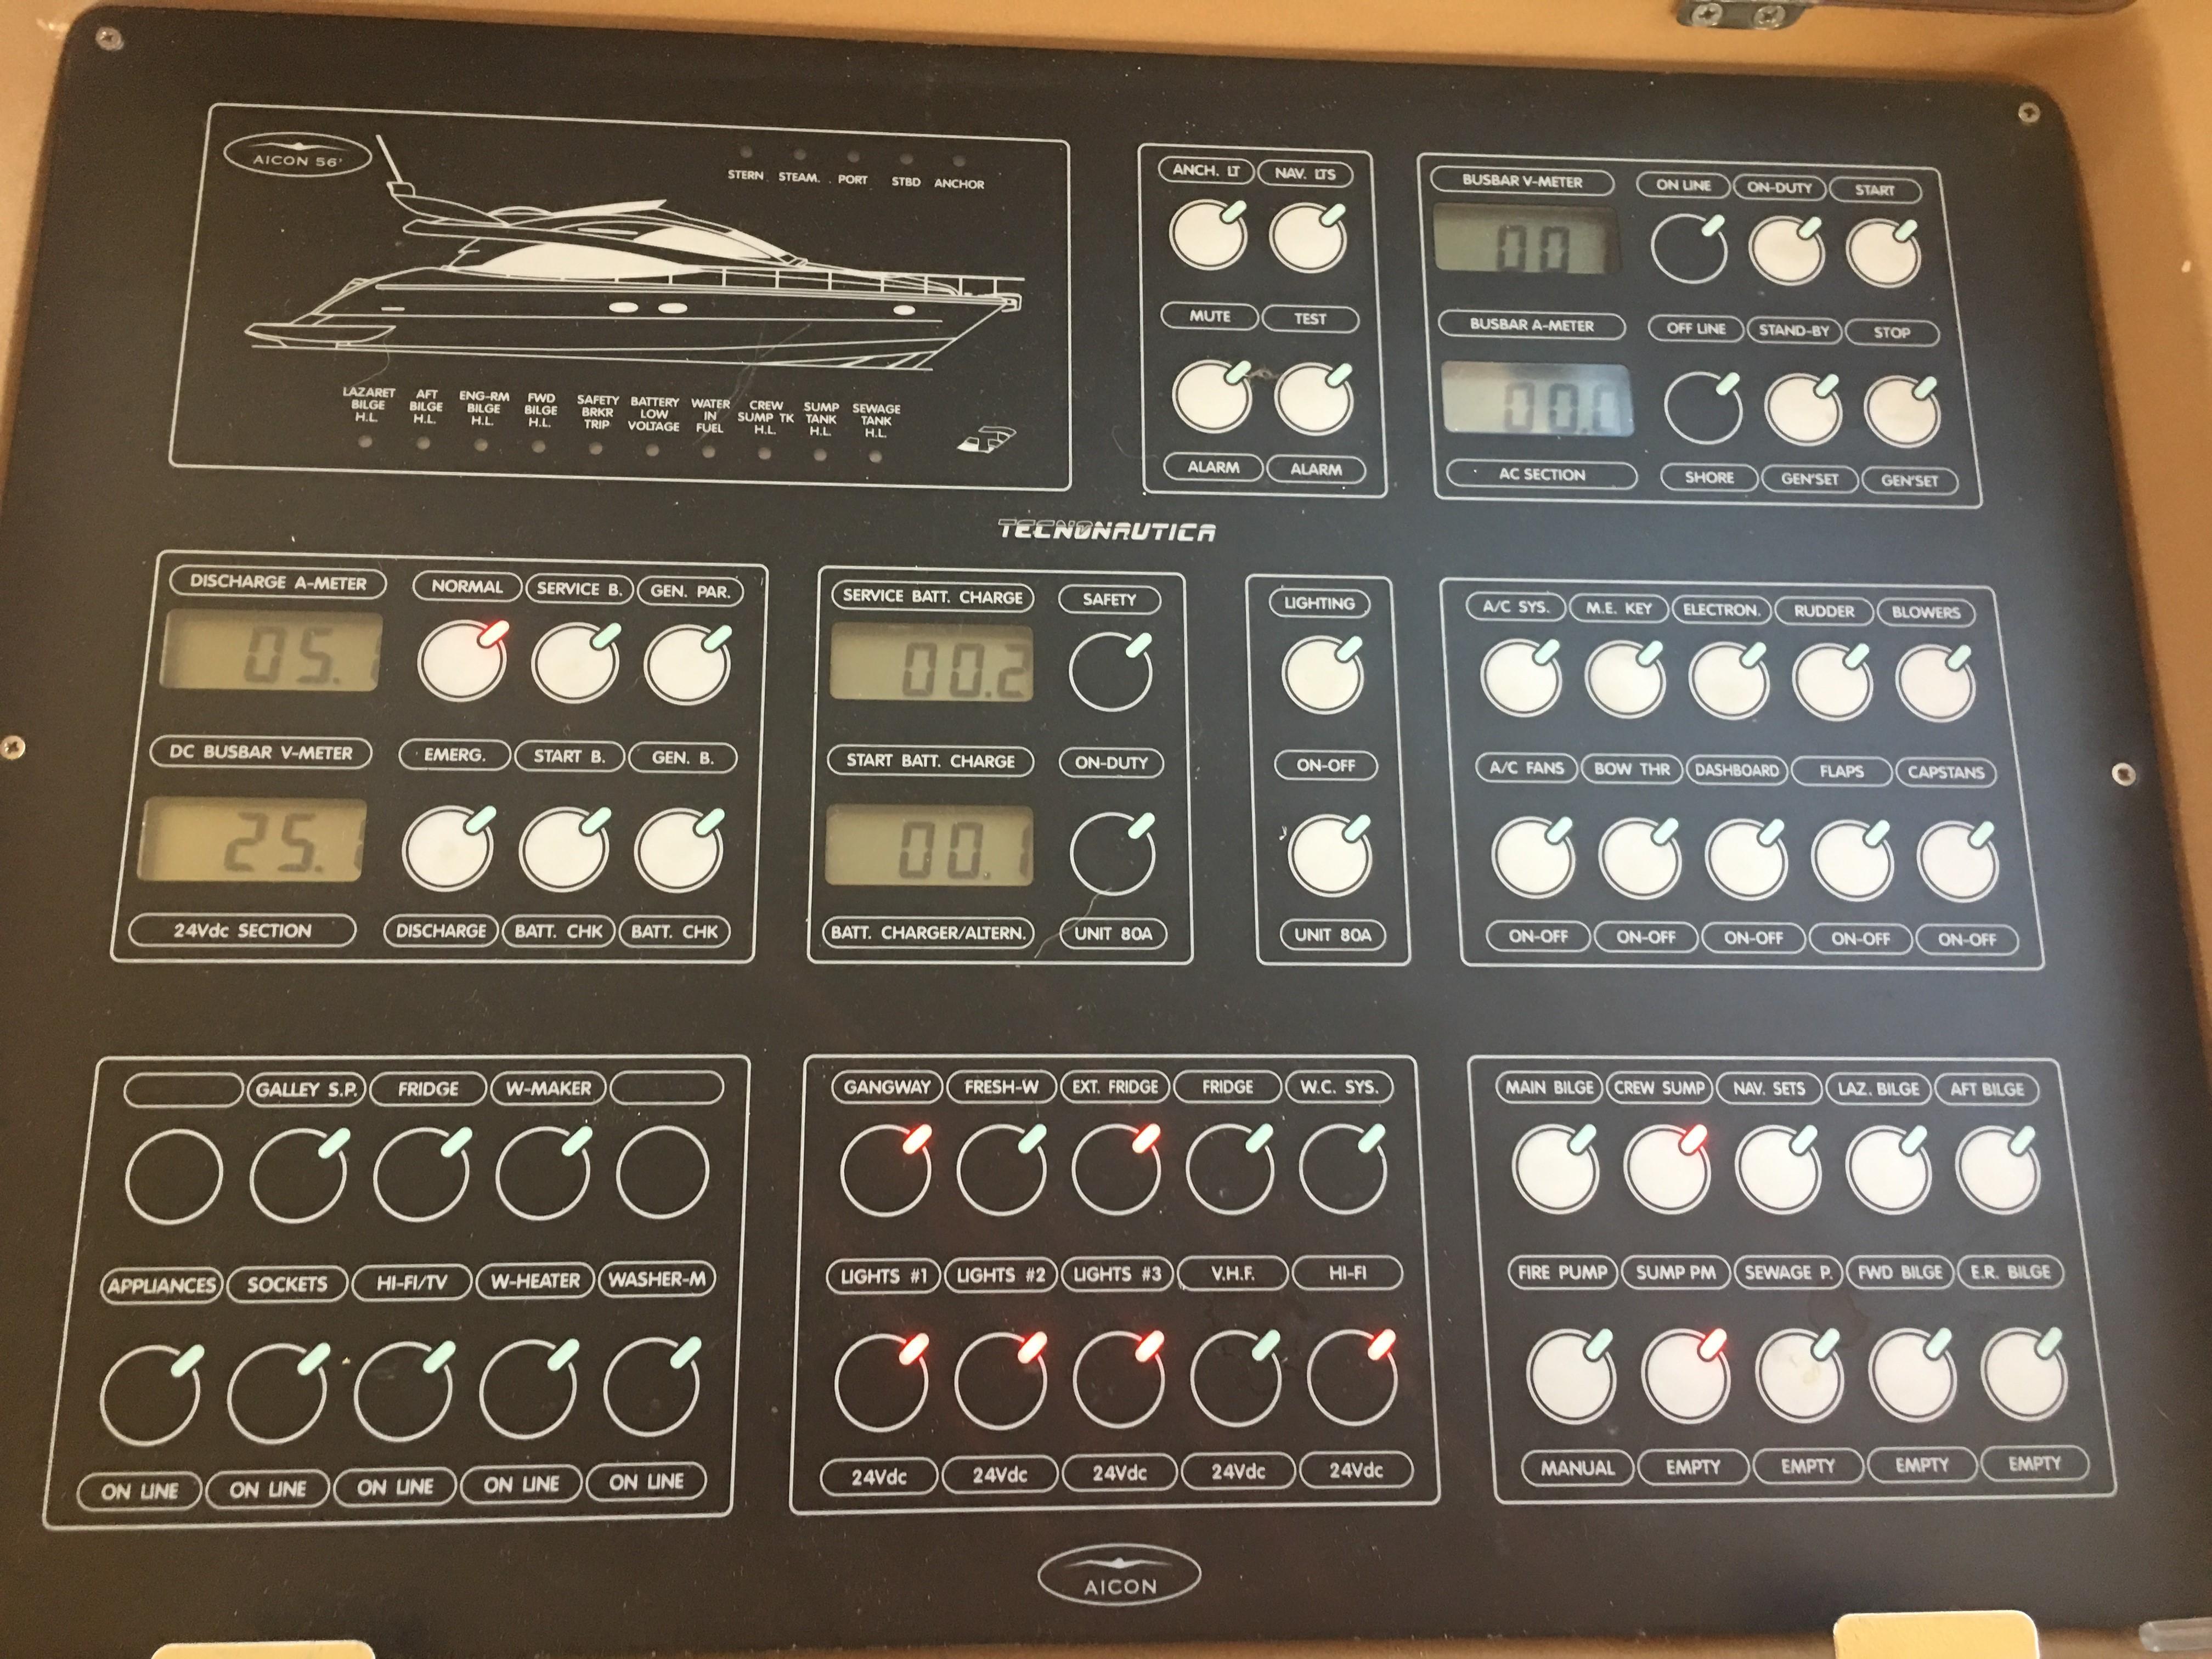 Ships control panel